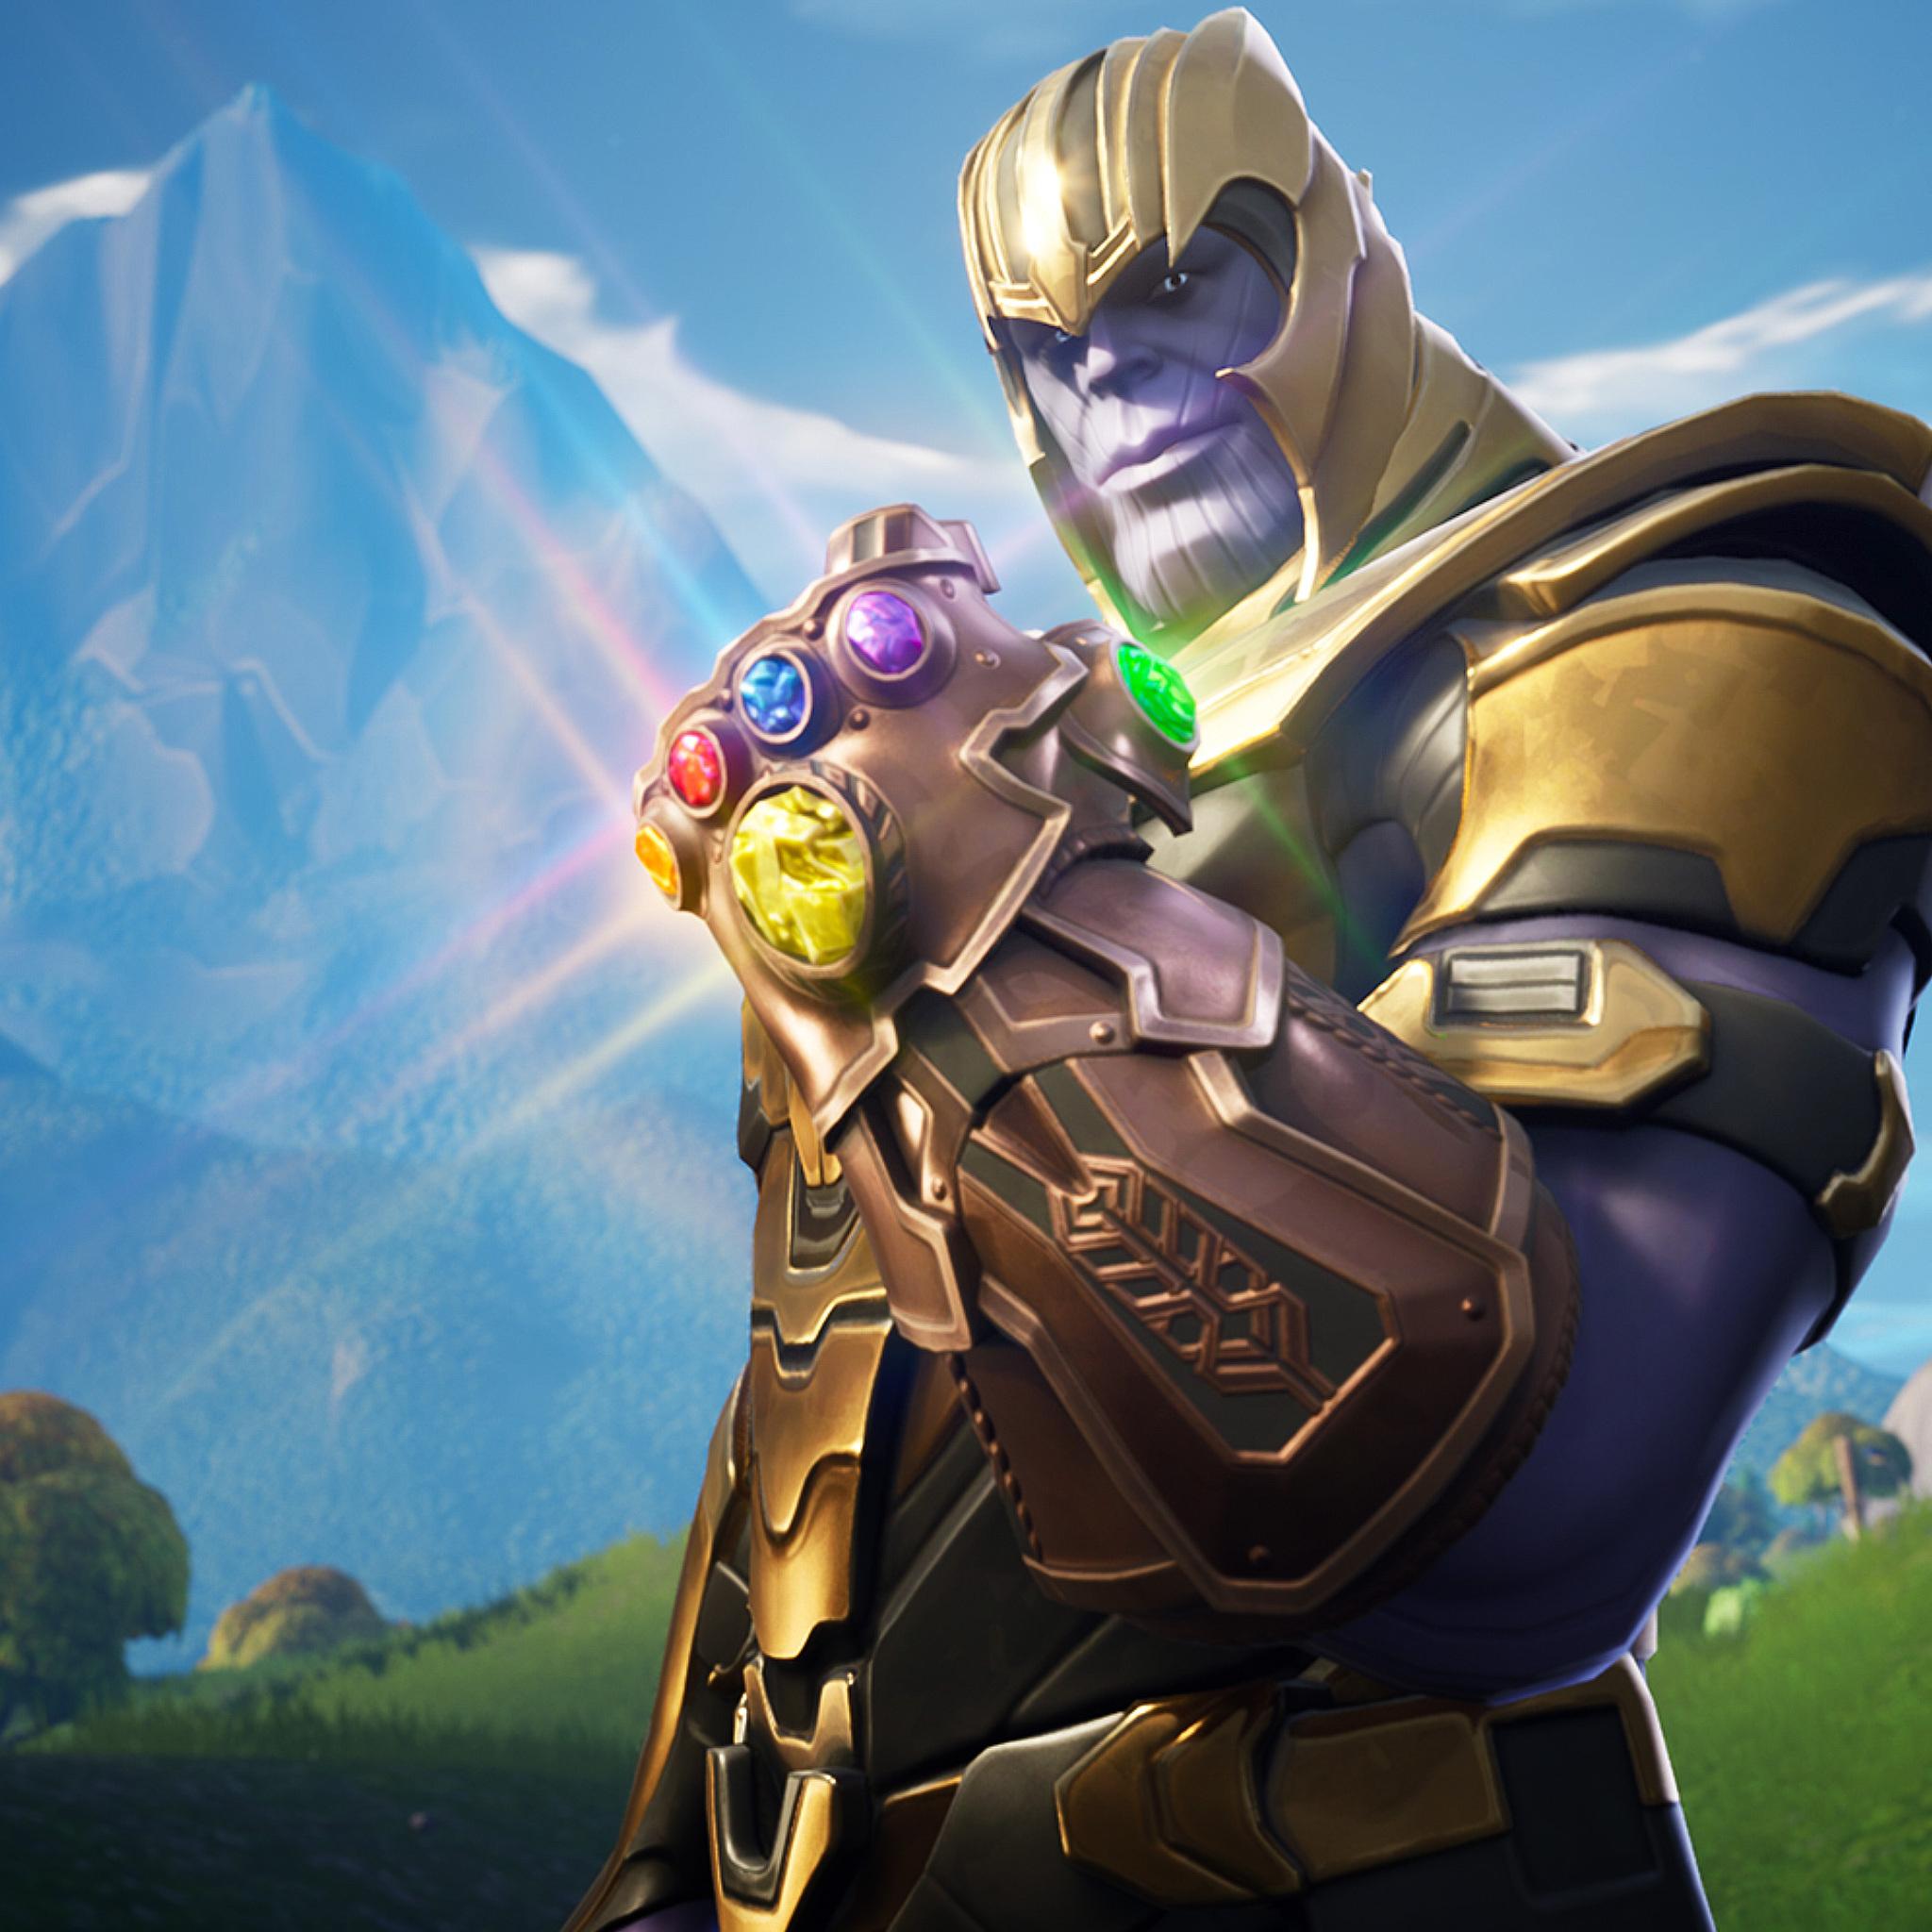 2048x2048 Thanos In Fortnite Battle Royale Ipad Air HD 4k